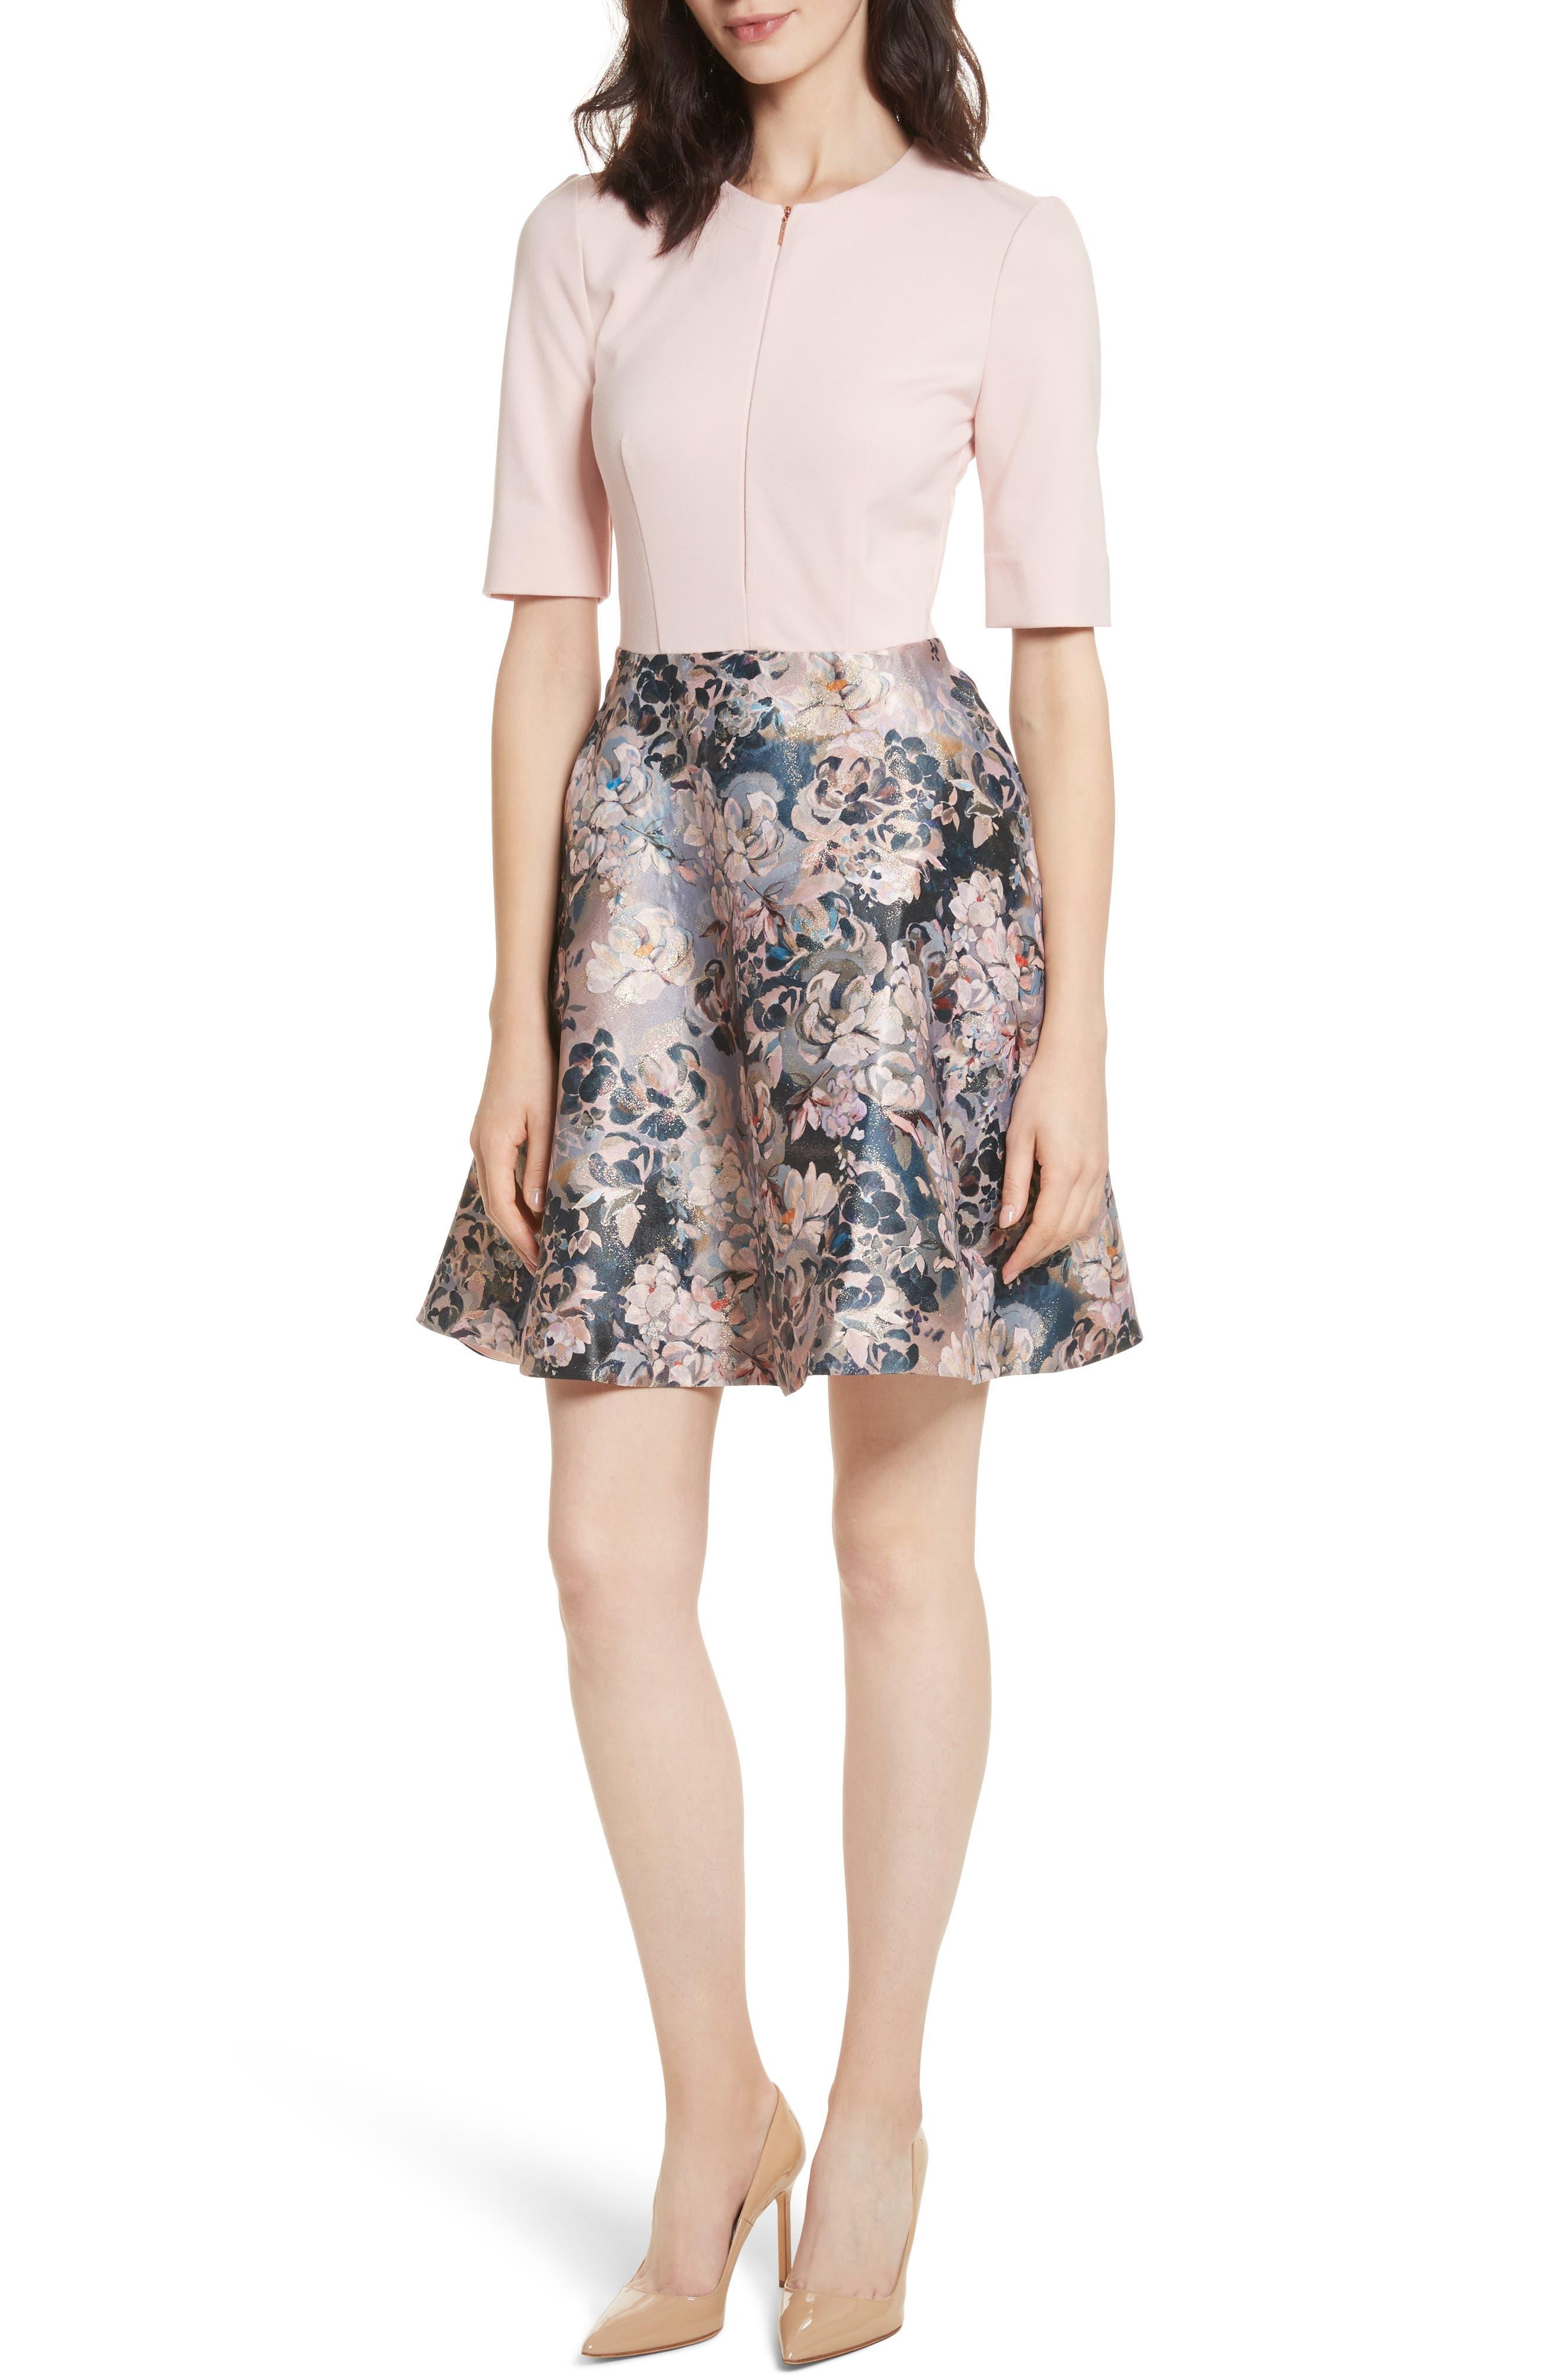 Eloquent Jacquard Skater Dress,                         Main,                         color, Pale Pink